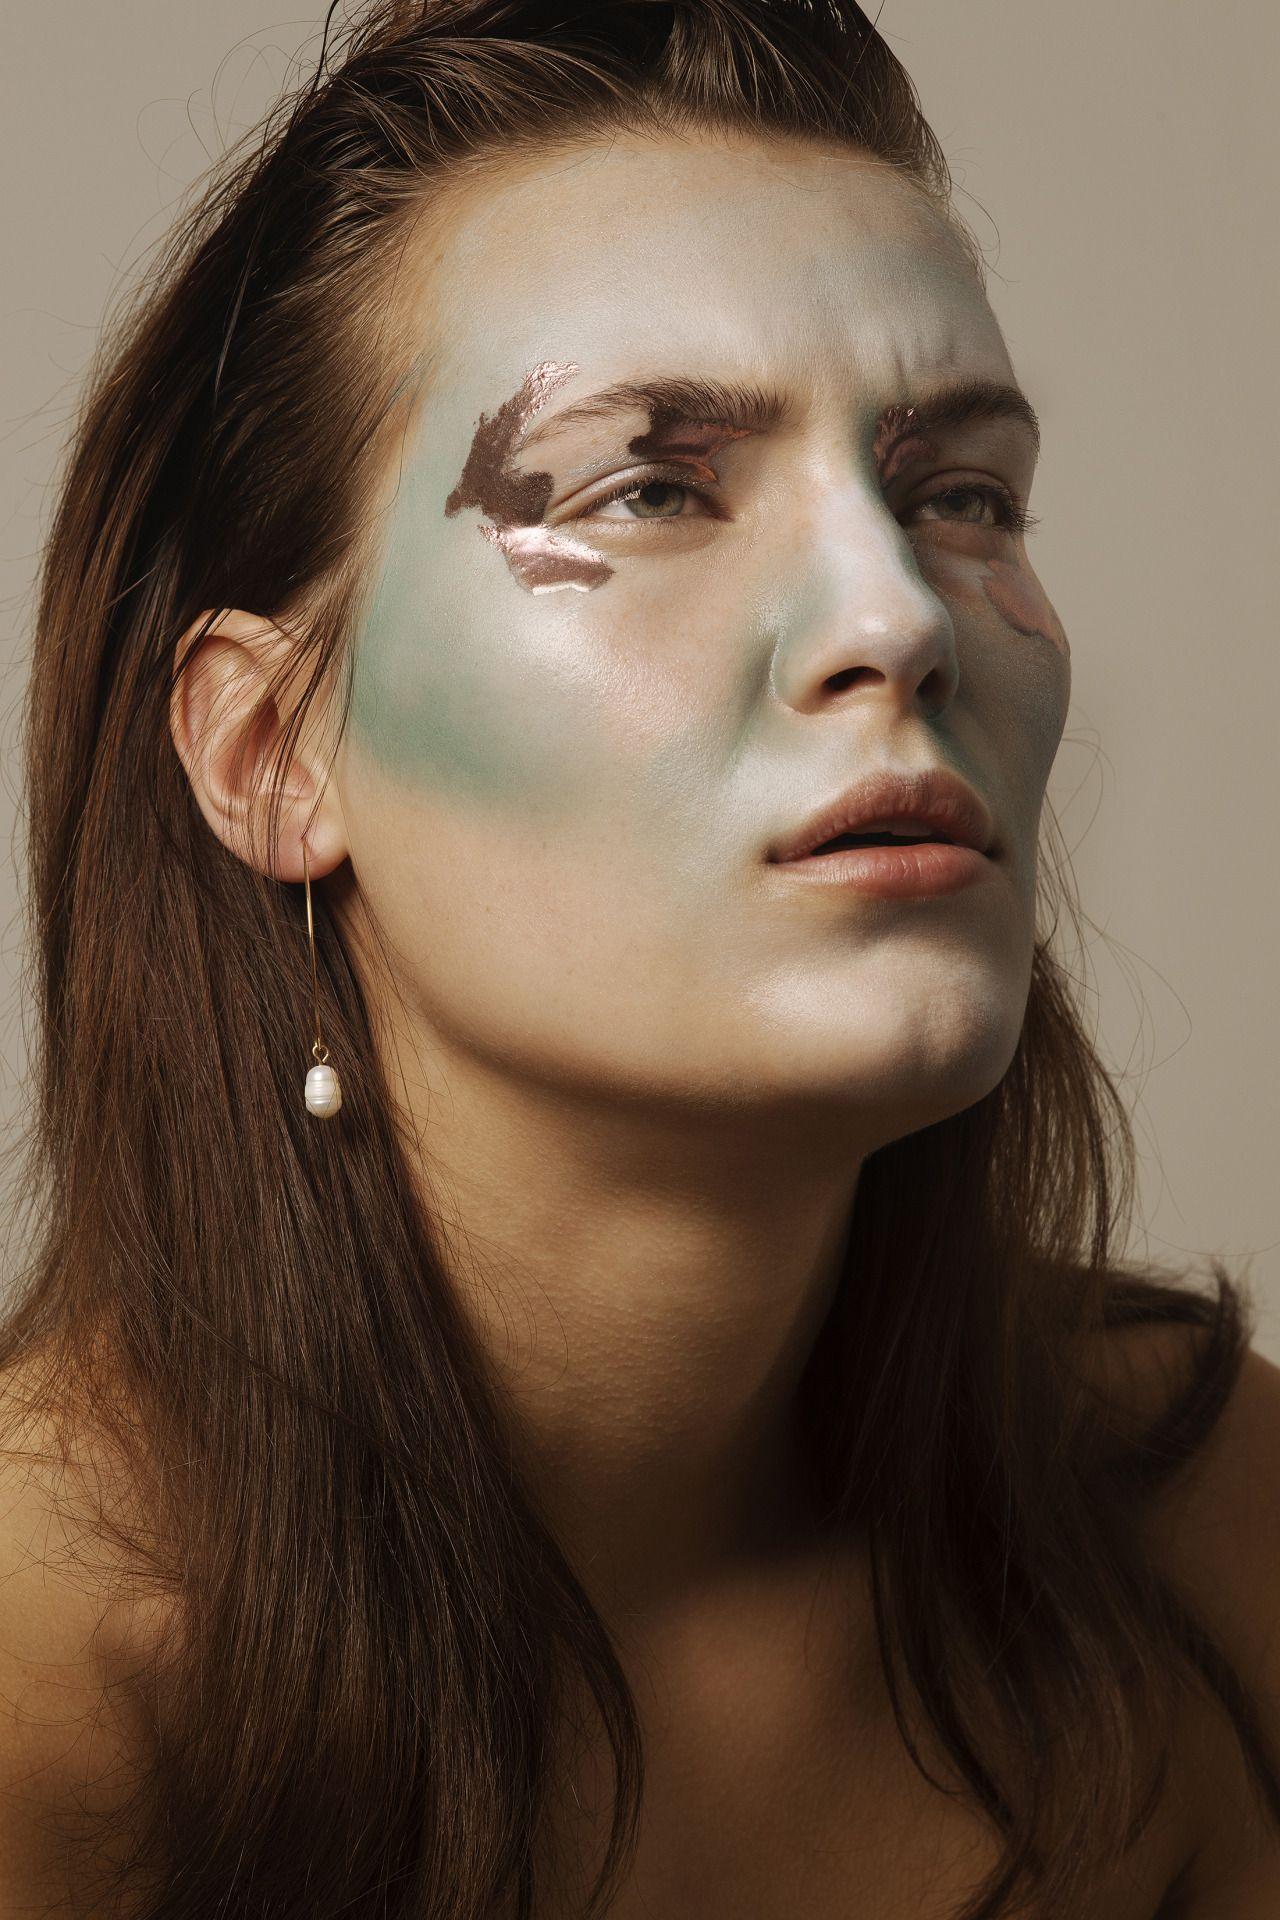 Nose piercing growing over  Pinterest u The worldus catalog of ideas